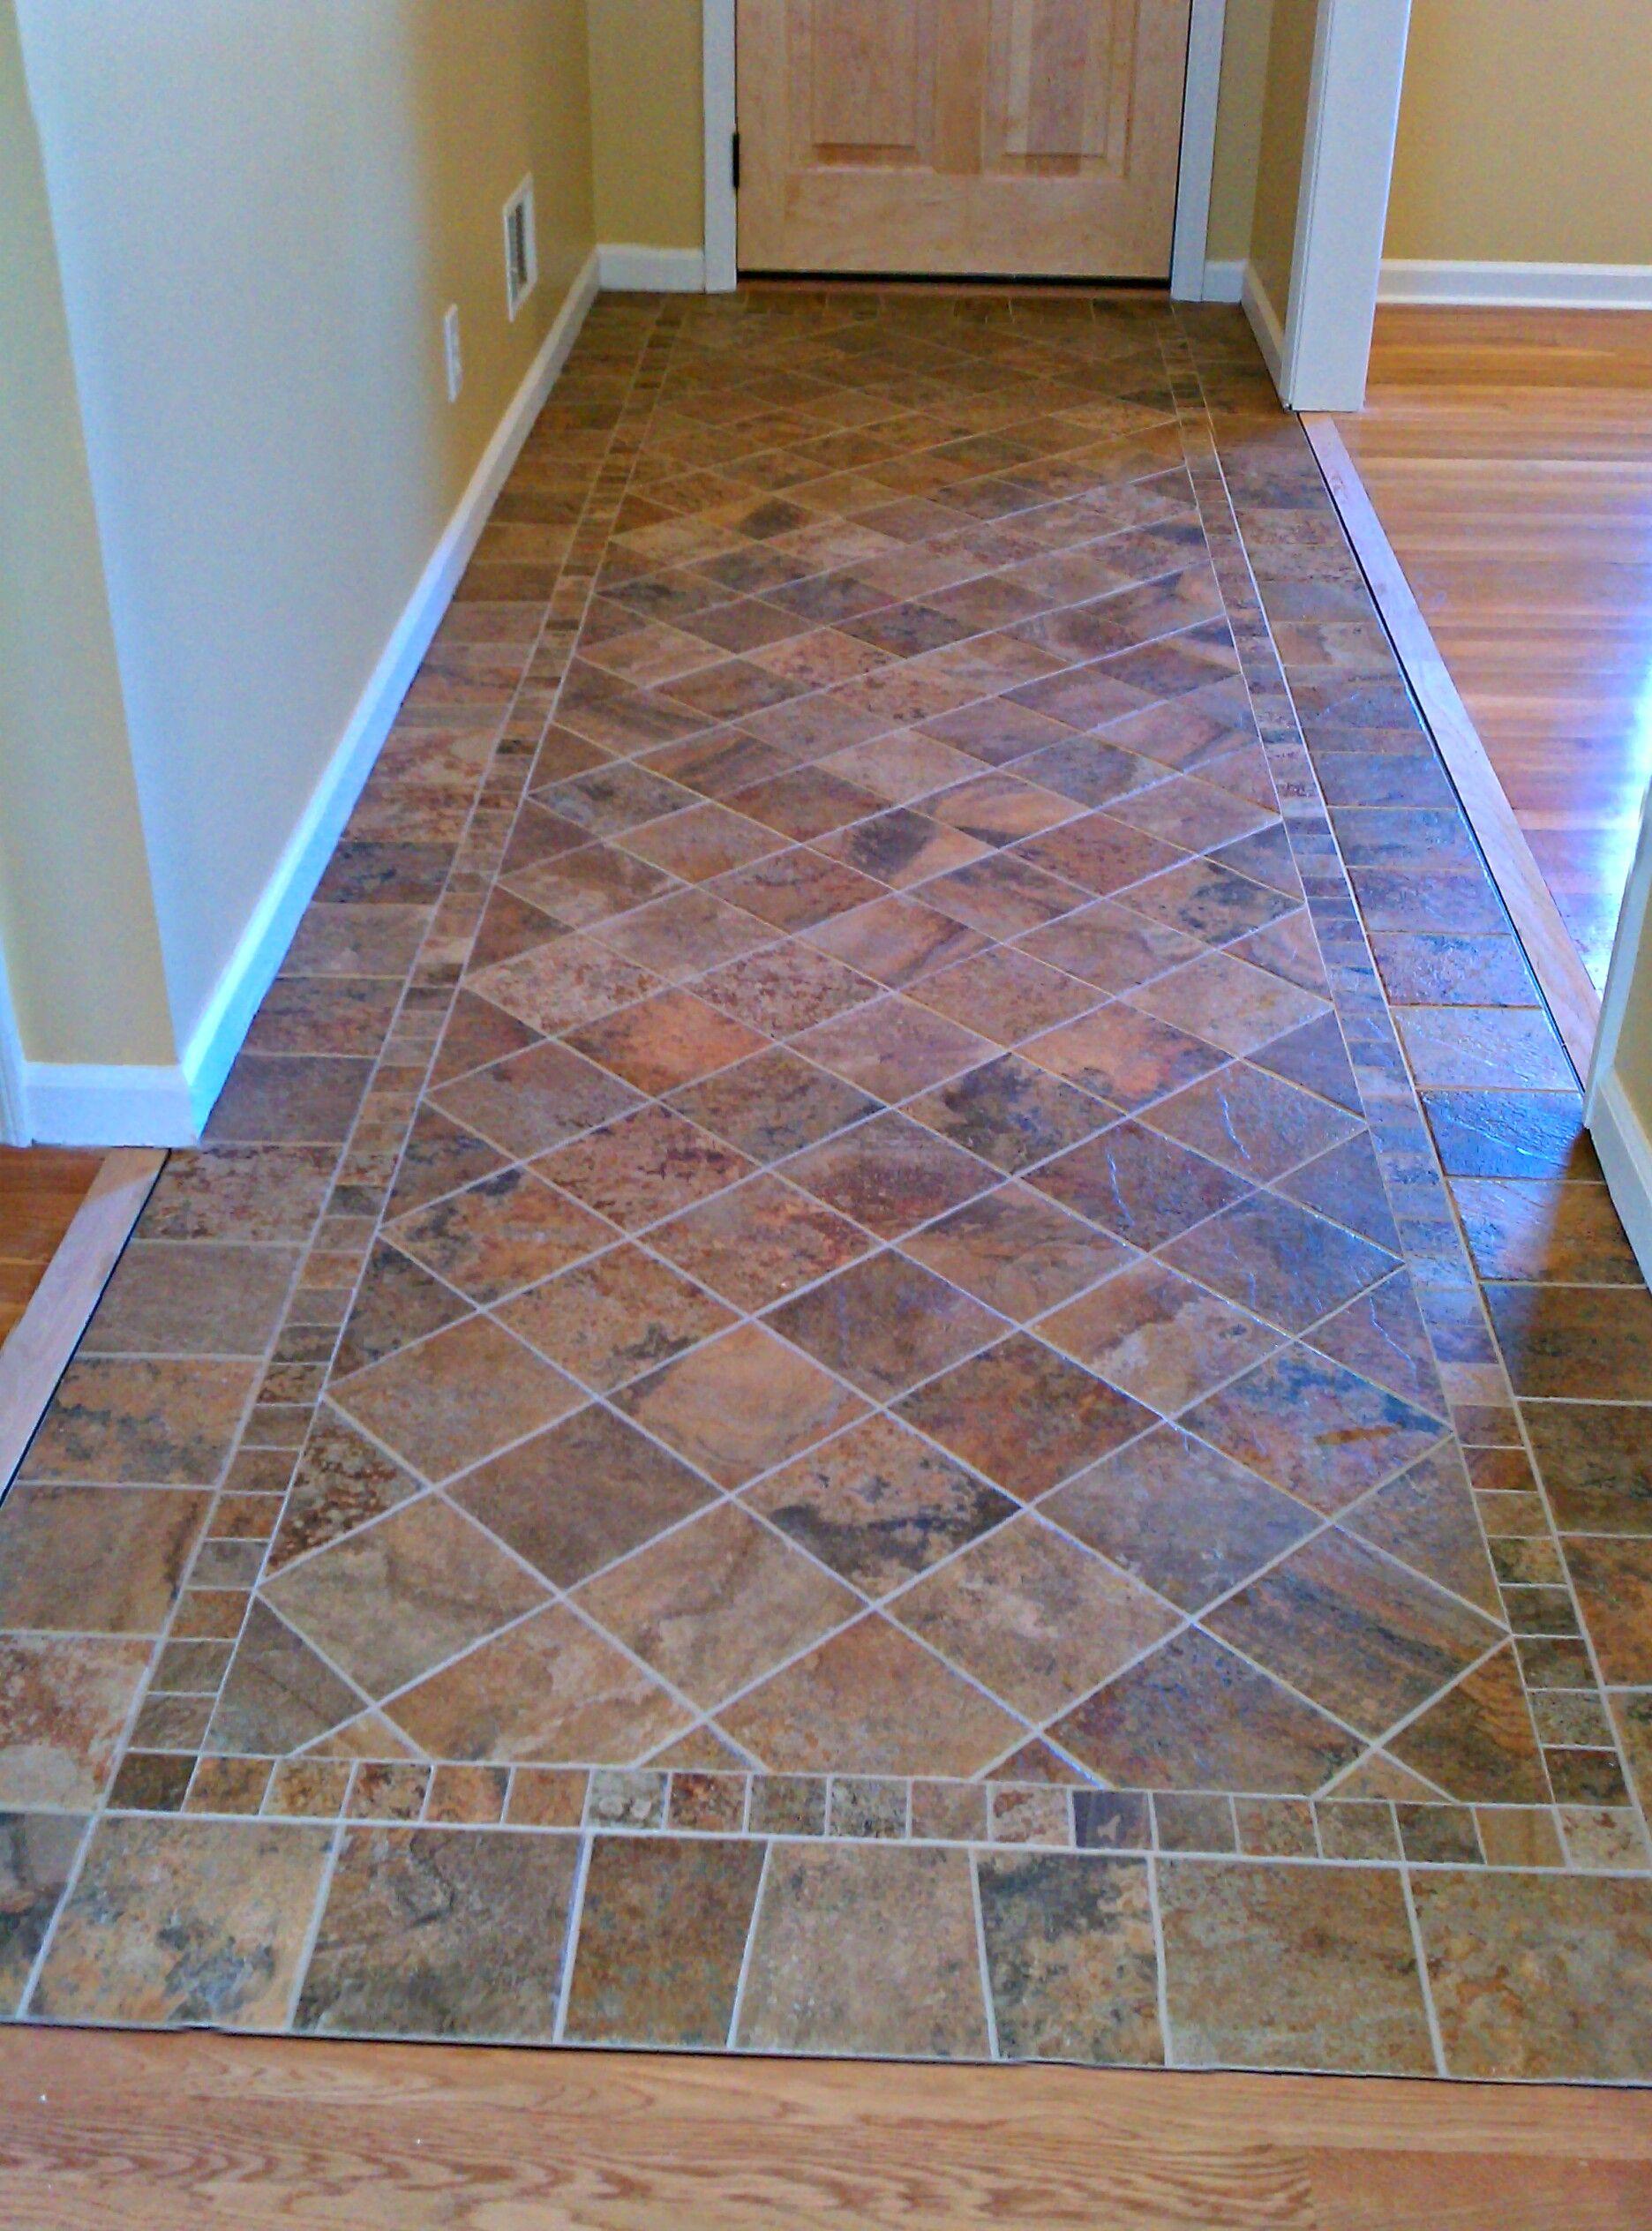 Tiles Entryway Flooring Entryway: Entryway Flooring, Stone Tile